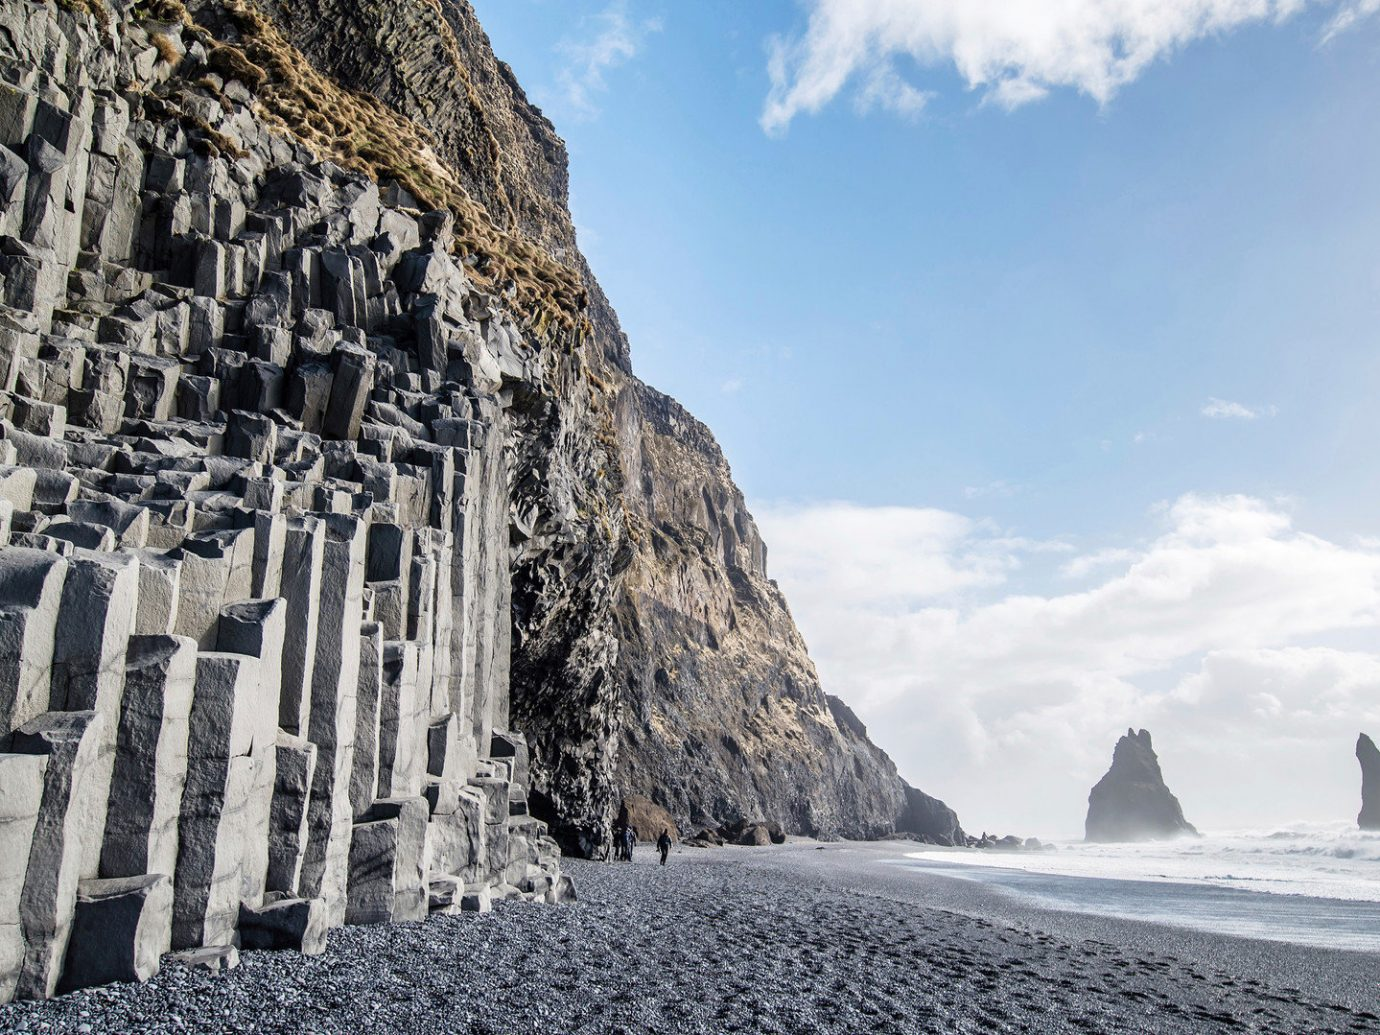 Iceland Outdoors + Adventure Road Trips outdoor sky mountain Nature landmark rock cliff Winter Coast terrain Sea ice formation day